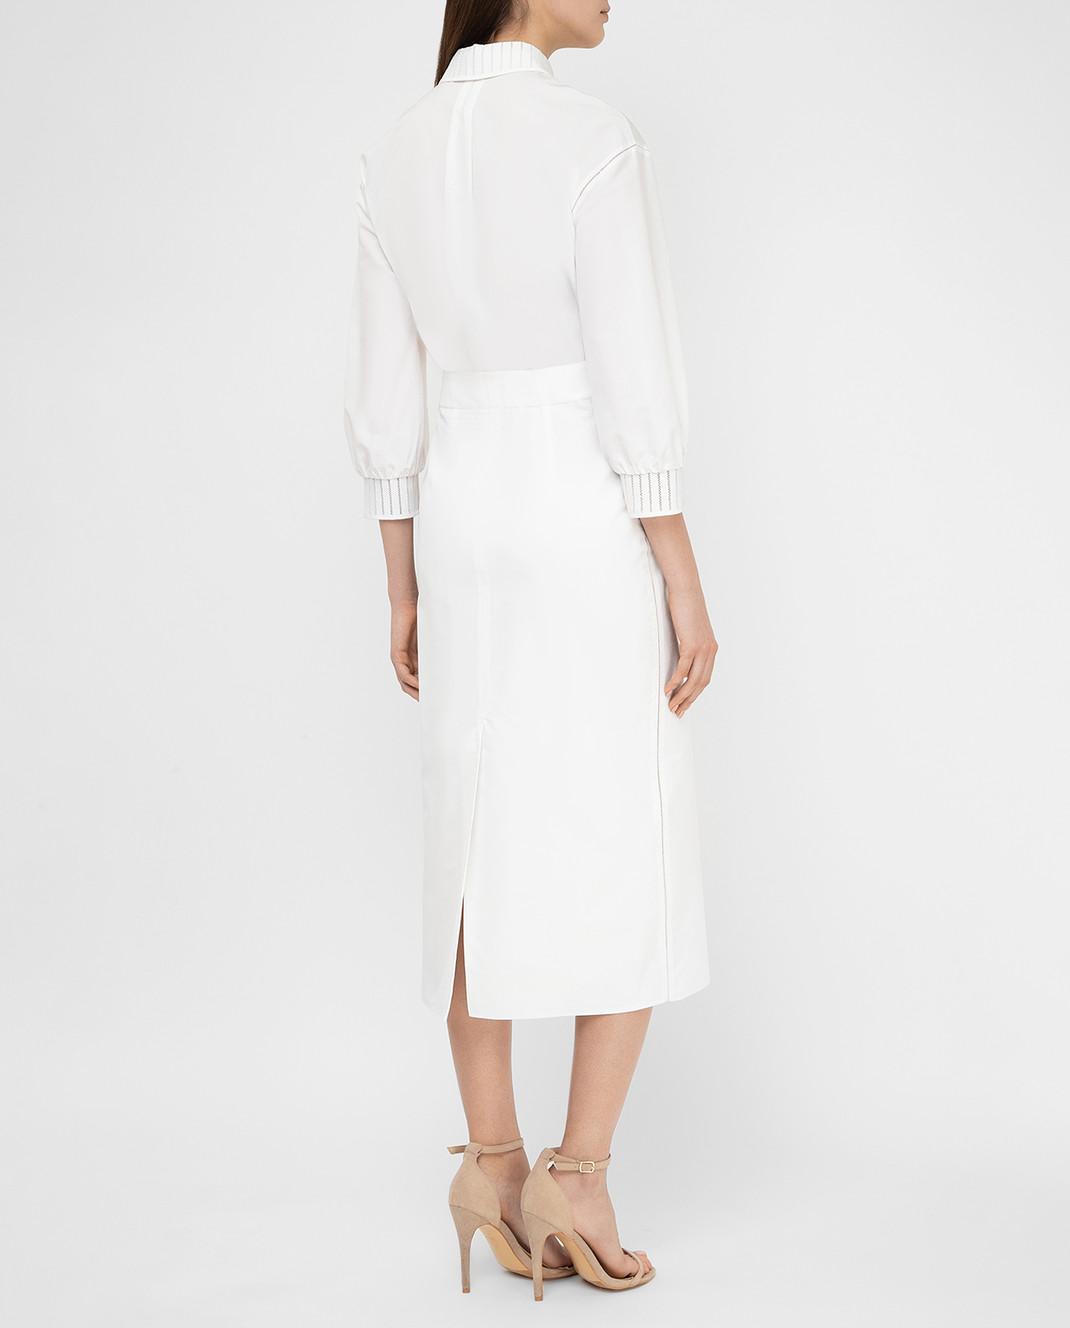 Loro Piana Белое платье F1FAI0540 изображение 4